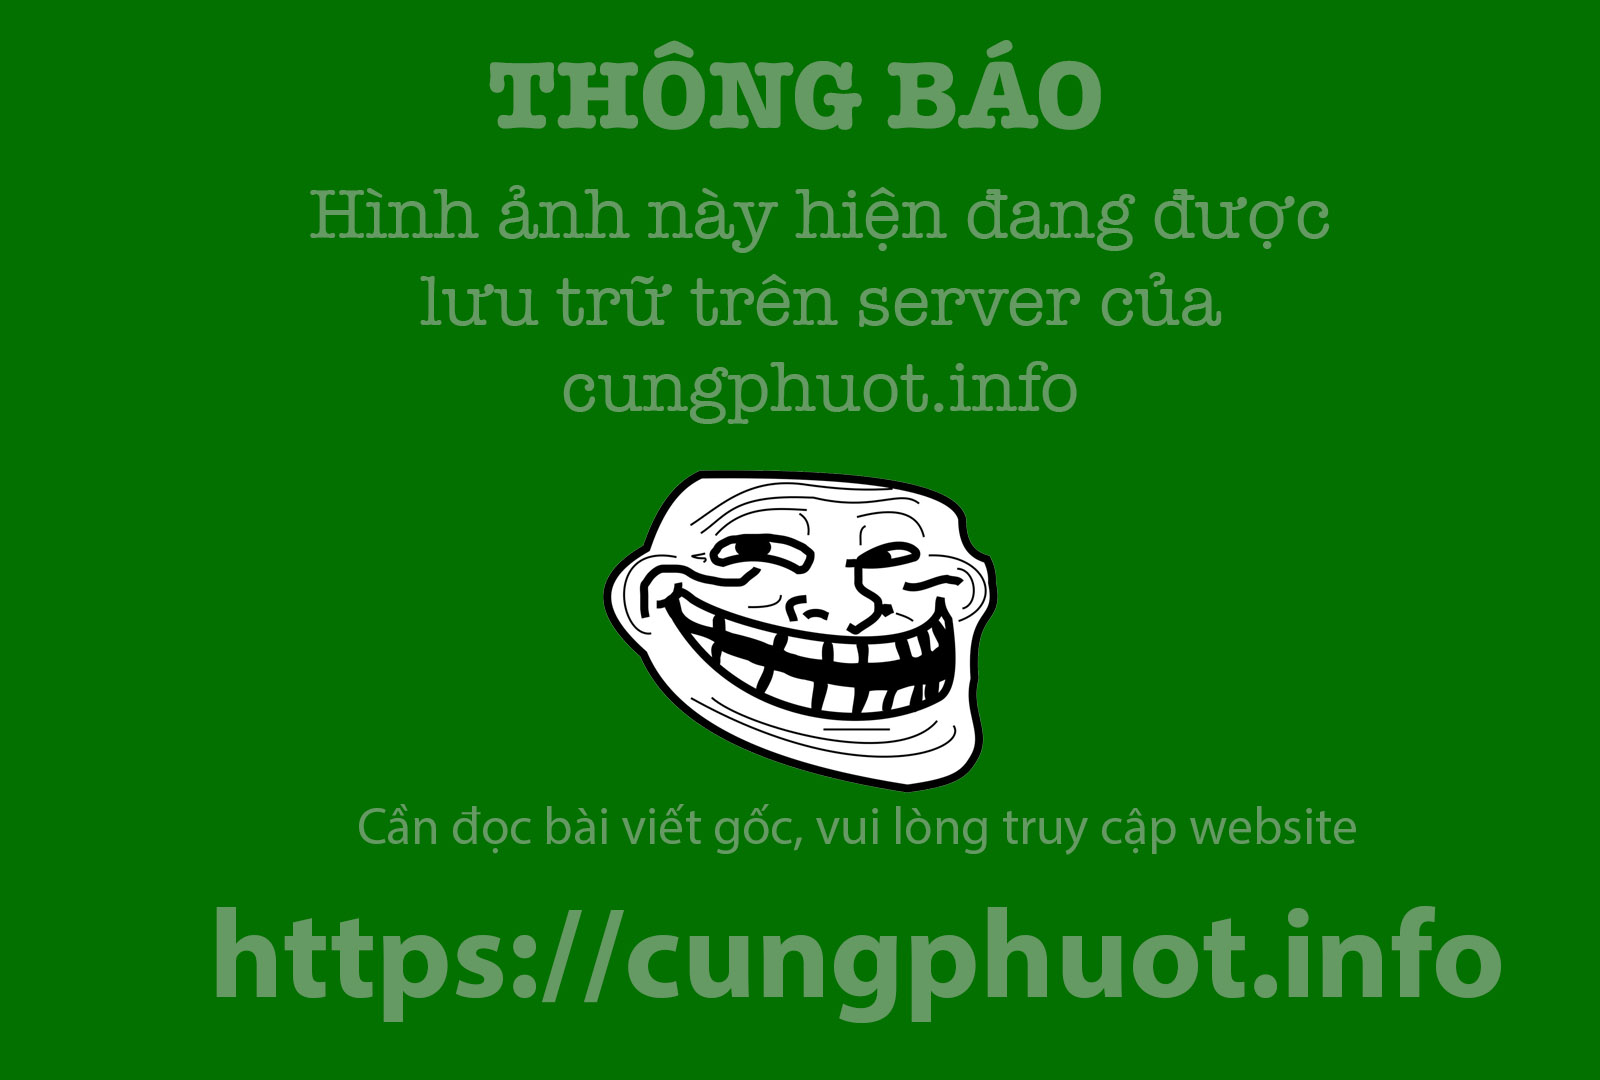 Dem hoi den long Trung thu lon nhat ca nuoc hinh anh 4